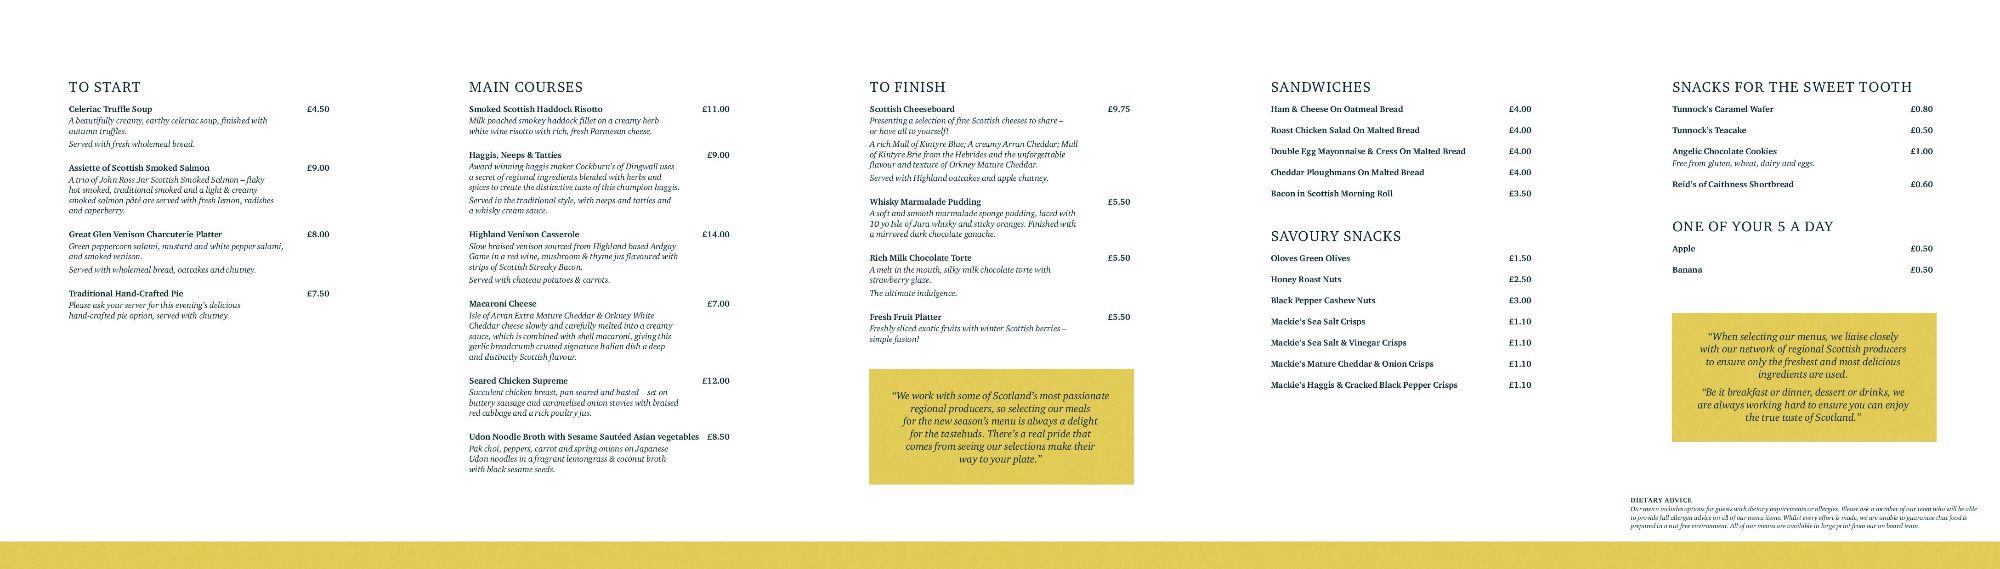 Image showing a sample of the Caledonian Sleeper lowlander menu circa 2019.